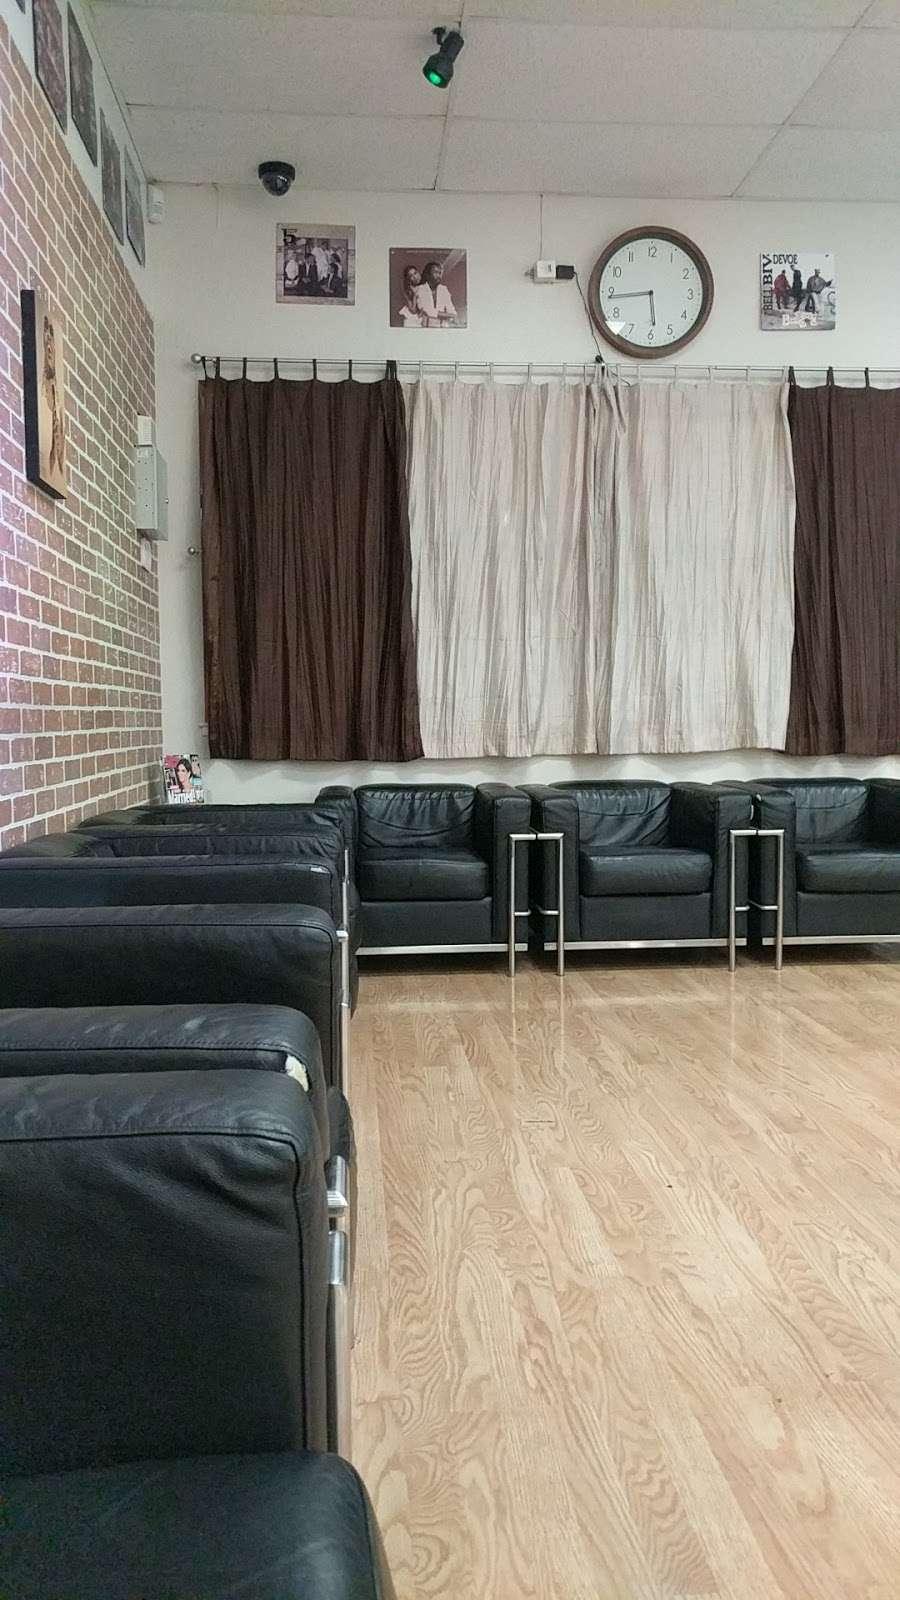 Nostalgic Soul Barber Studio, 15 San Pablo Ave, Pinole, CA 15, USA